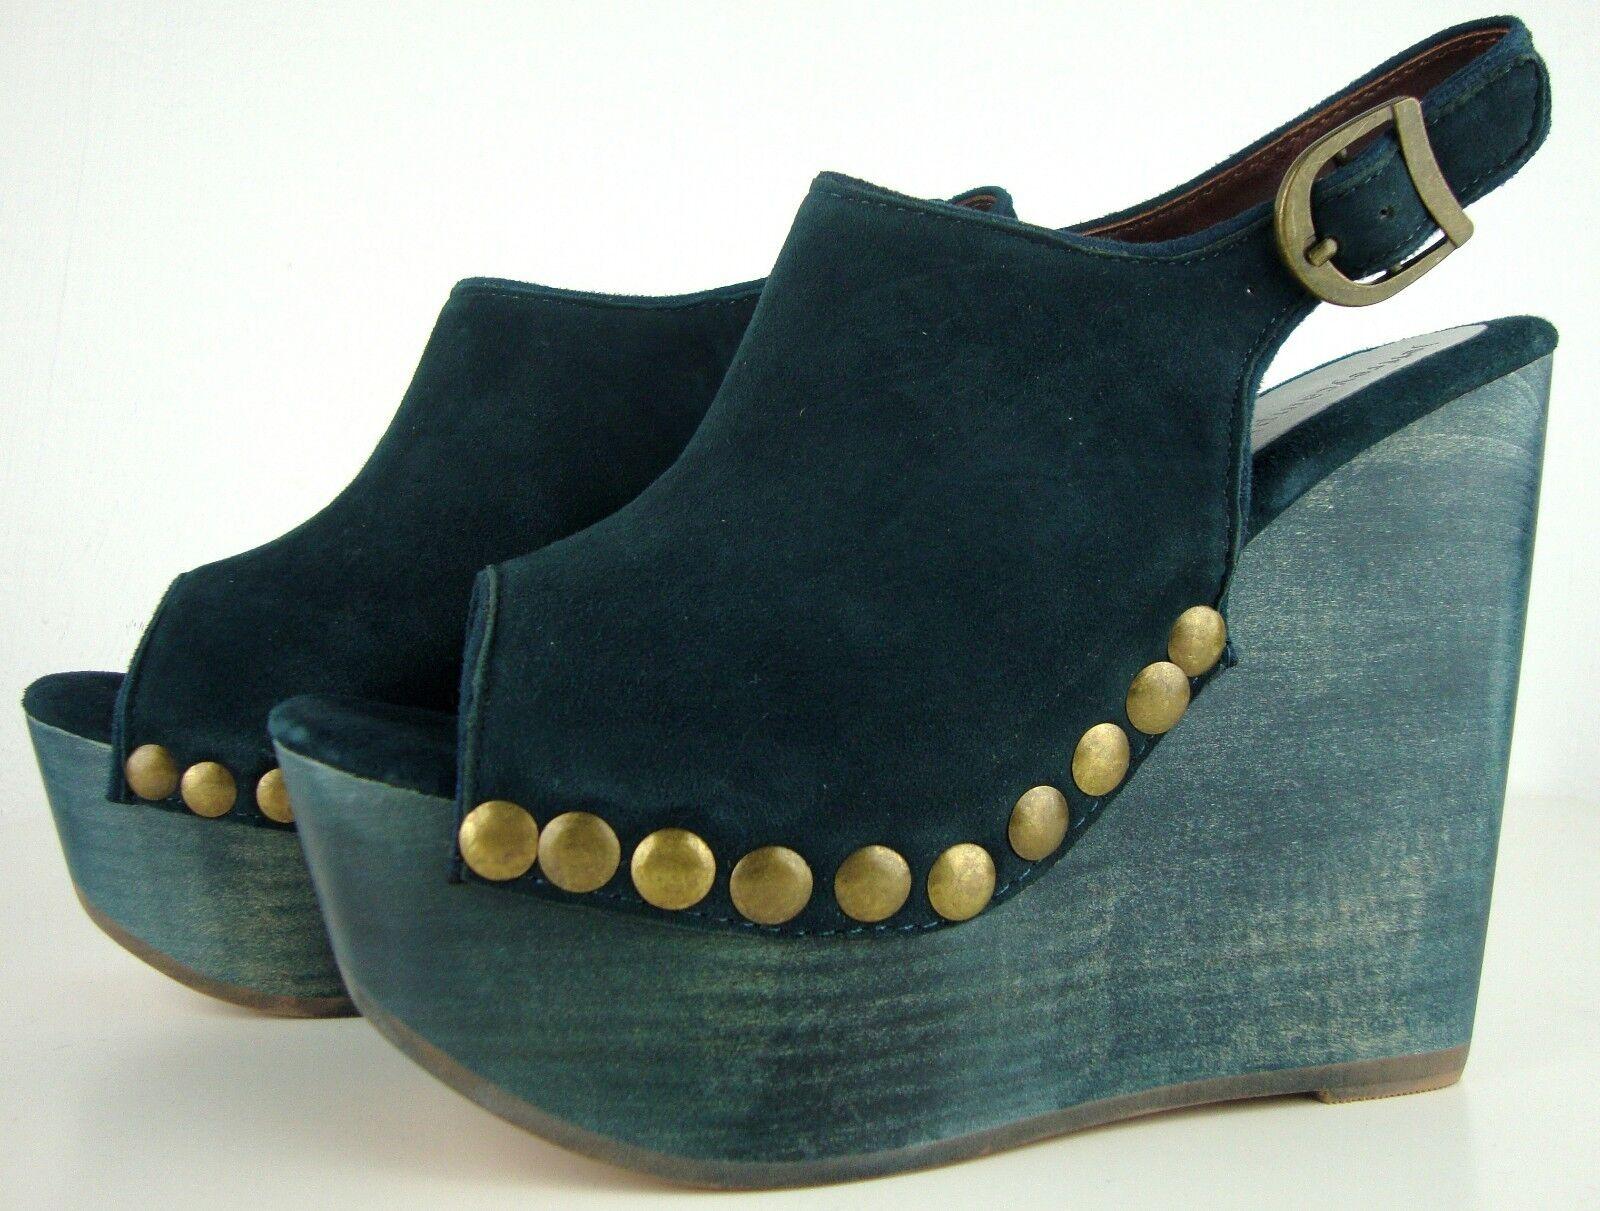 JEFFREY CAMPBELL Schuhe SNICK STUD Platform Sandales Damen Plateau Schuhe CAMPBELL Leder Gr40 NEU 0de9ad